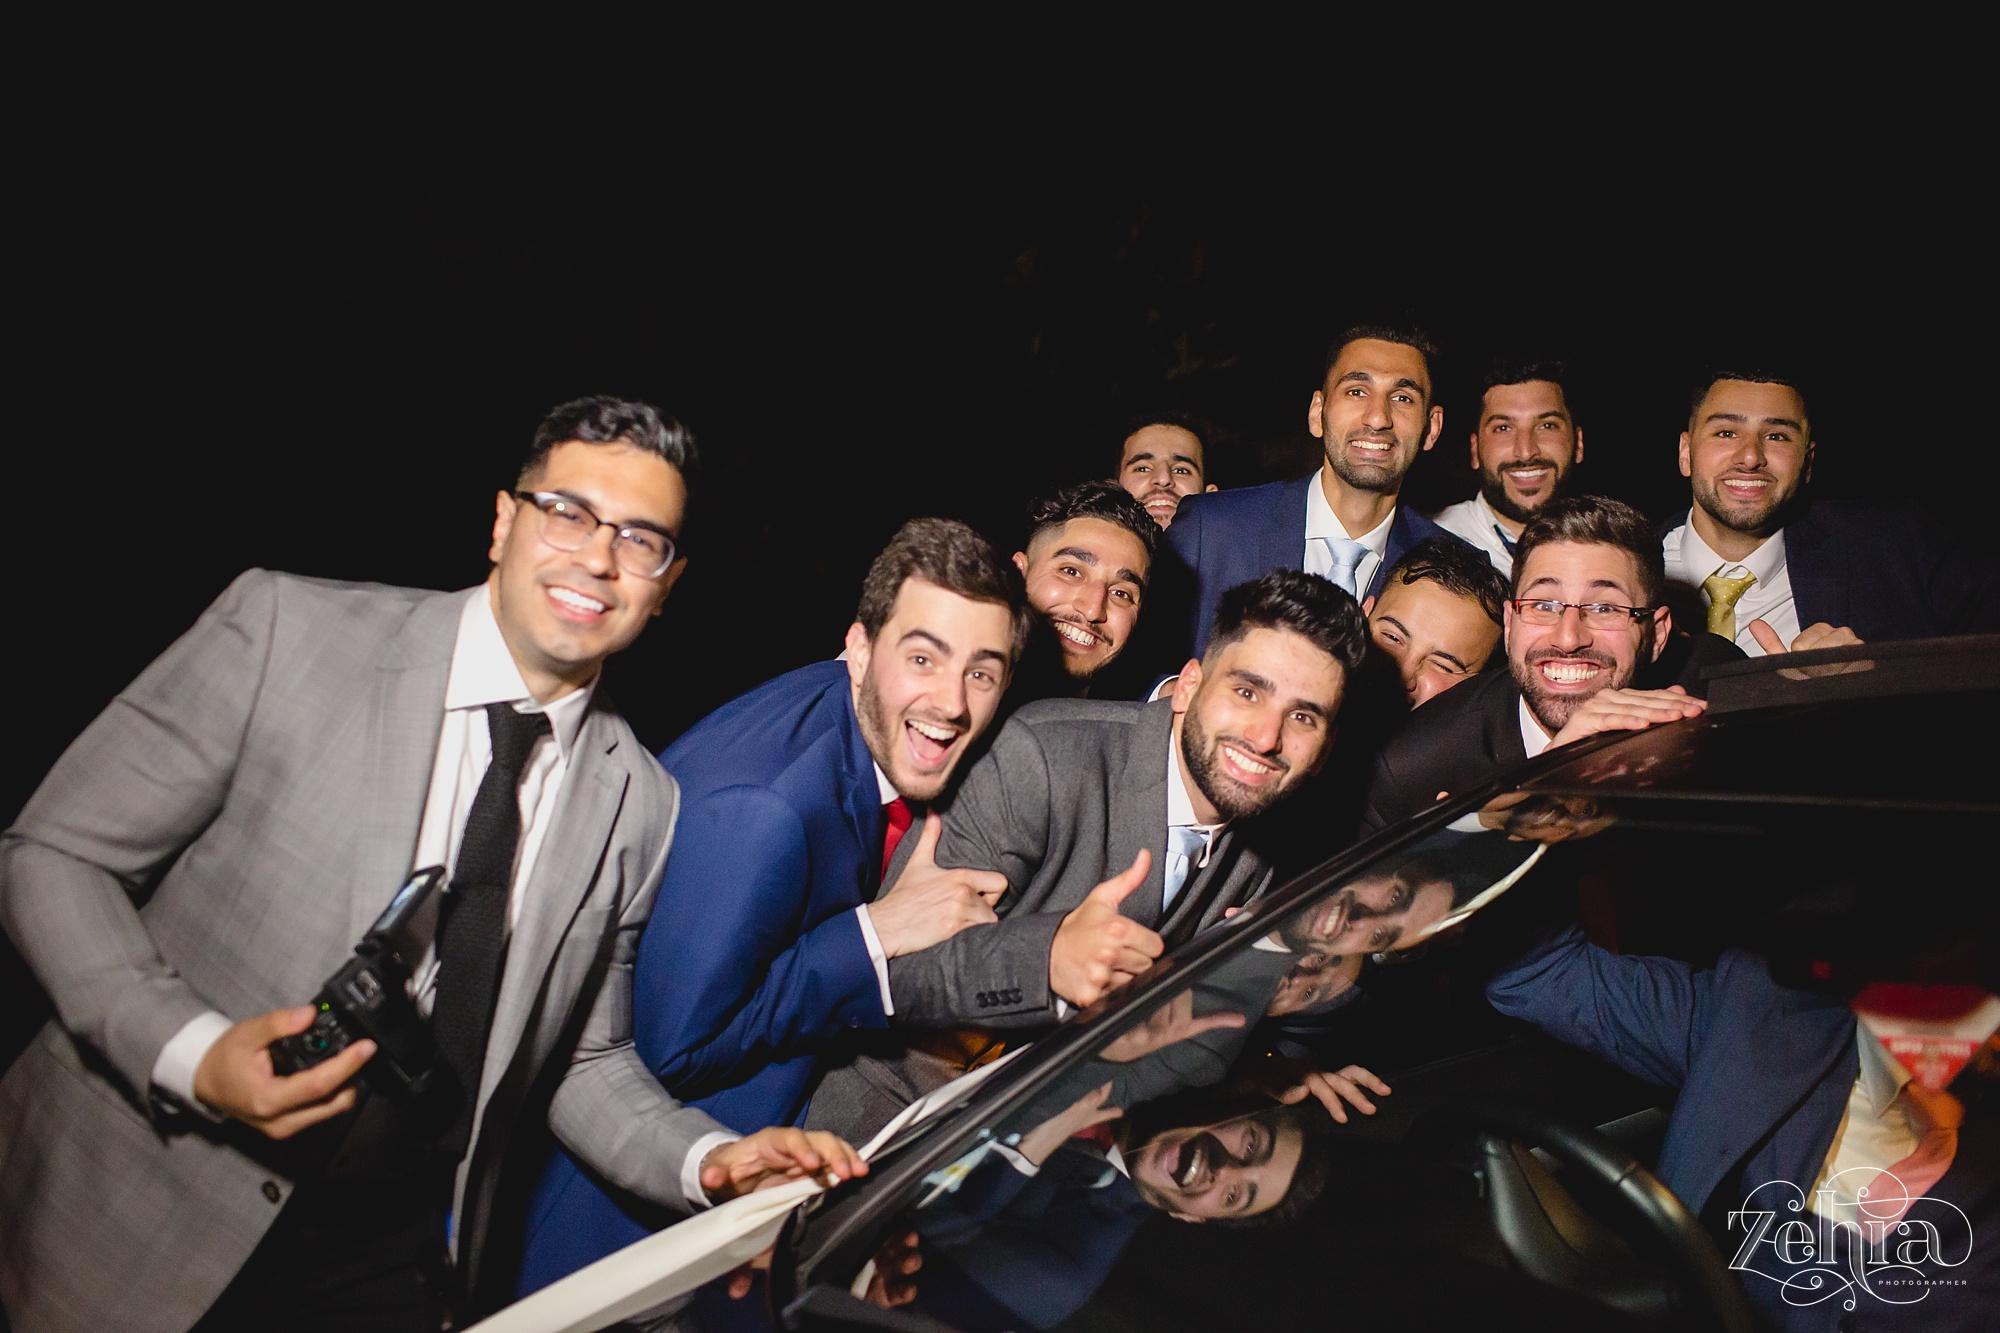 zehra photographer mere cheshire wedding_0070.jpg